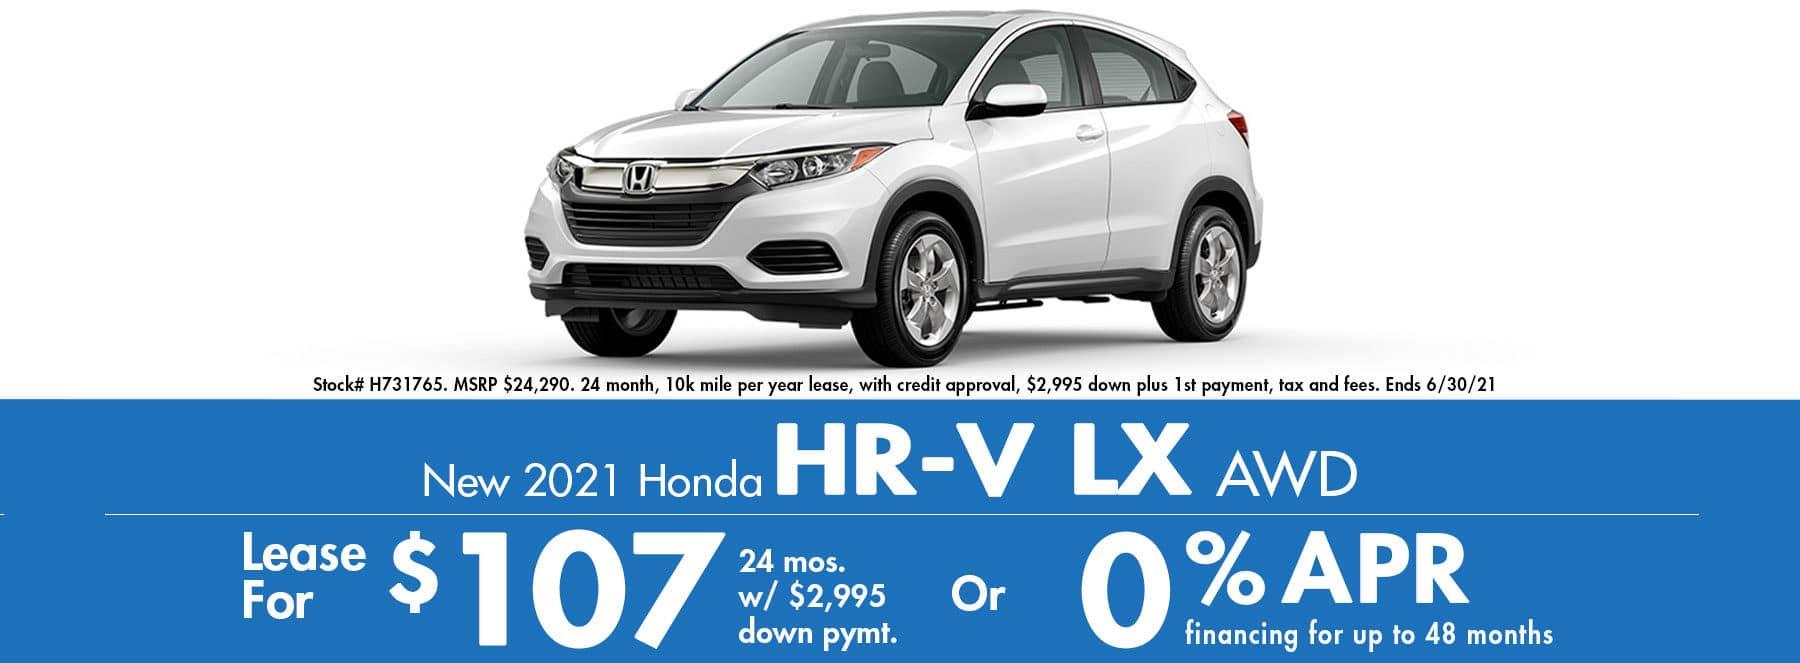 2021 Honda HR-V LX AWD $107 / Month or 0% APR!